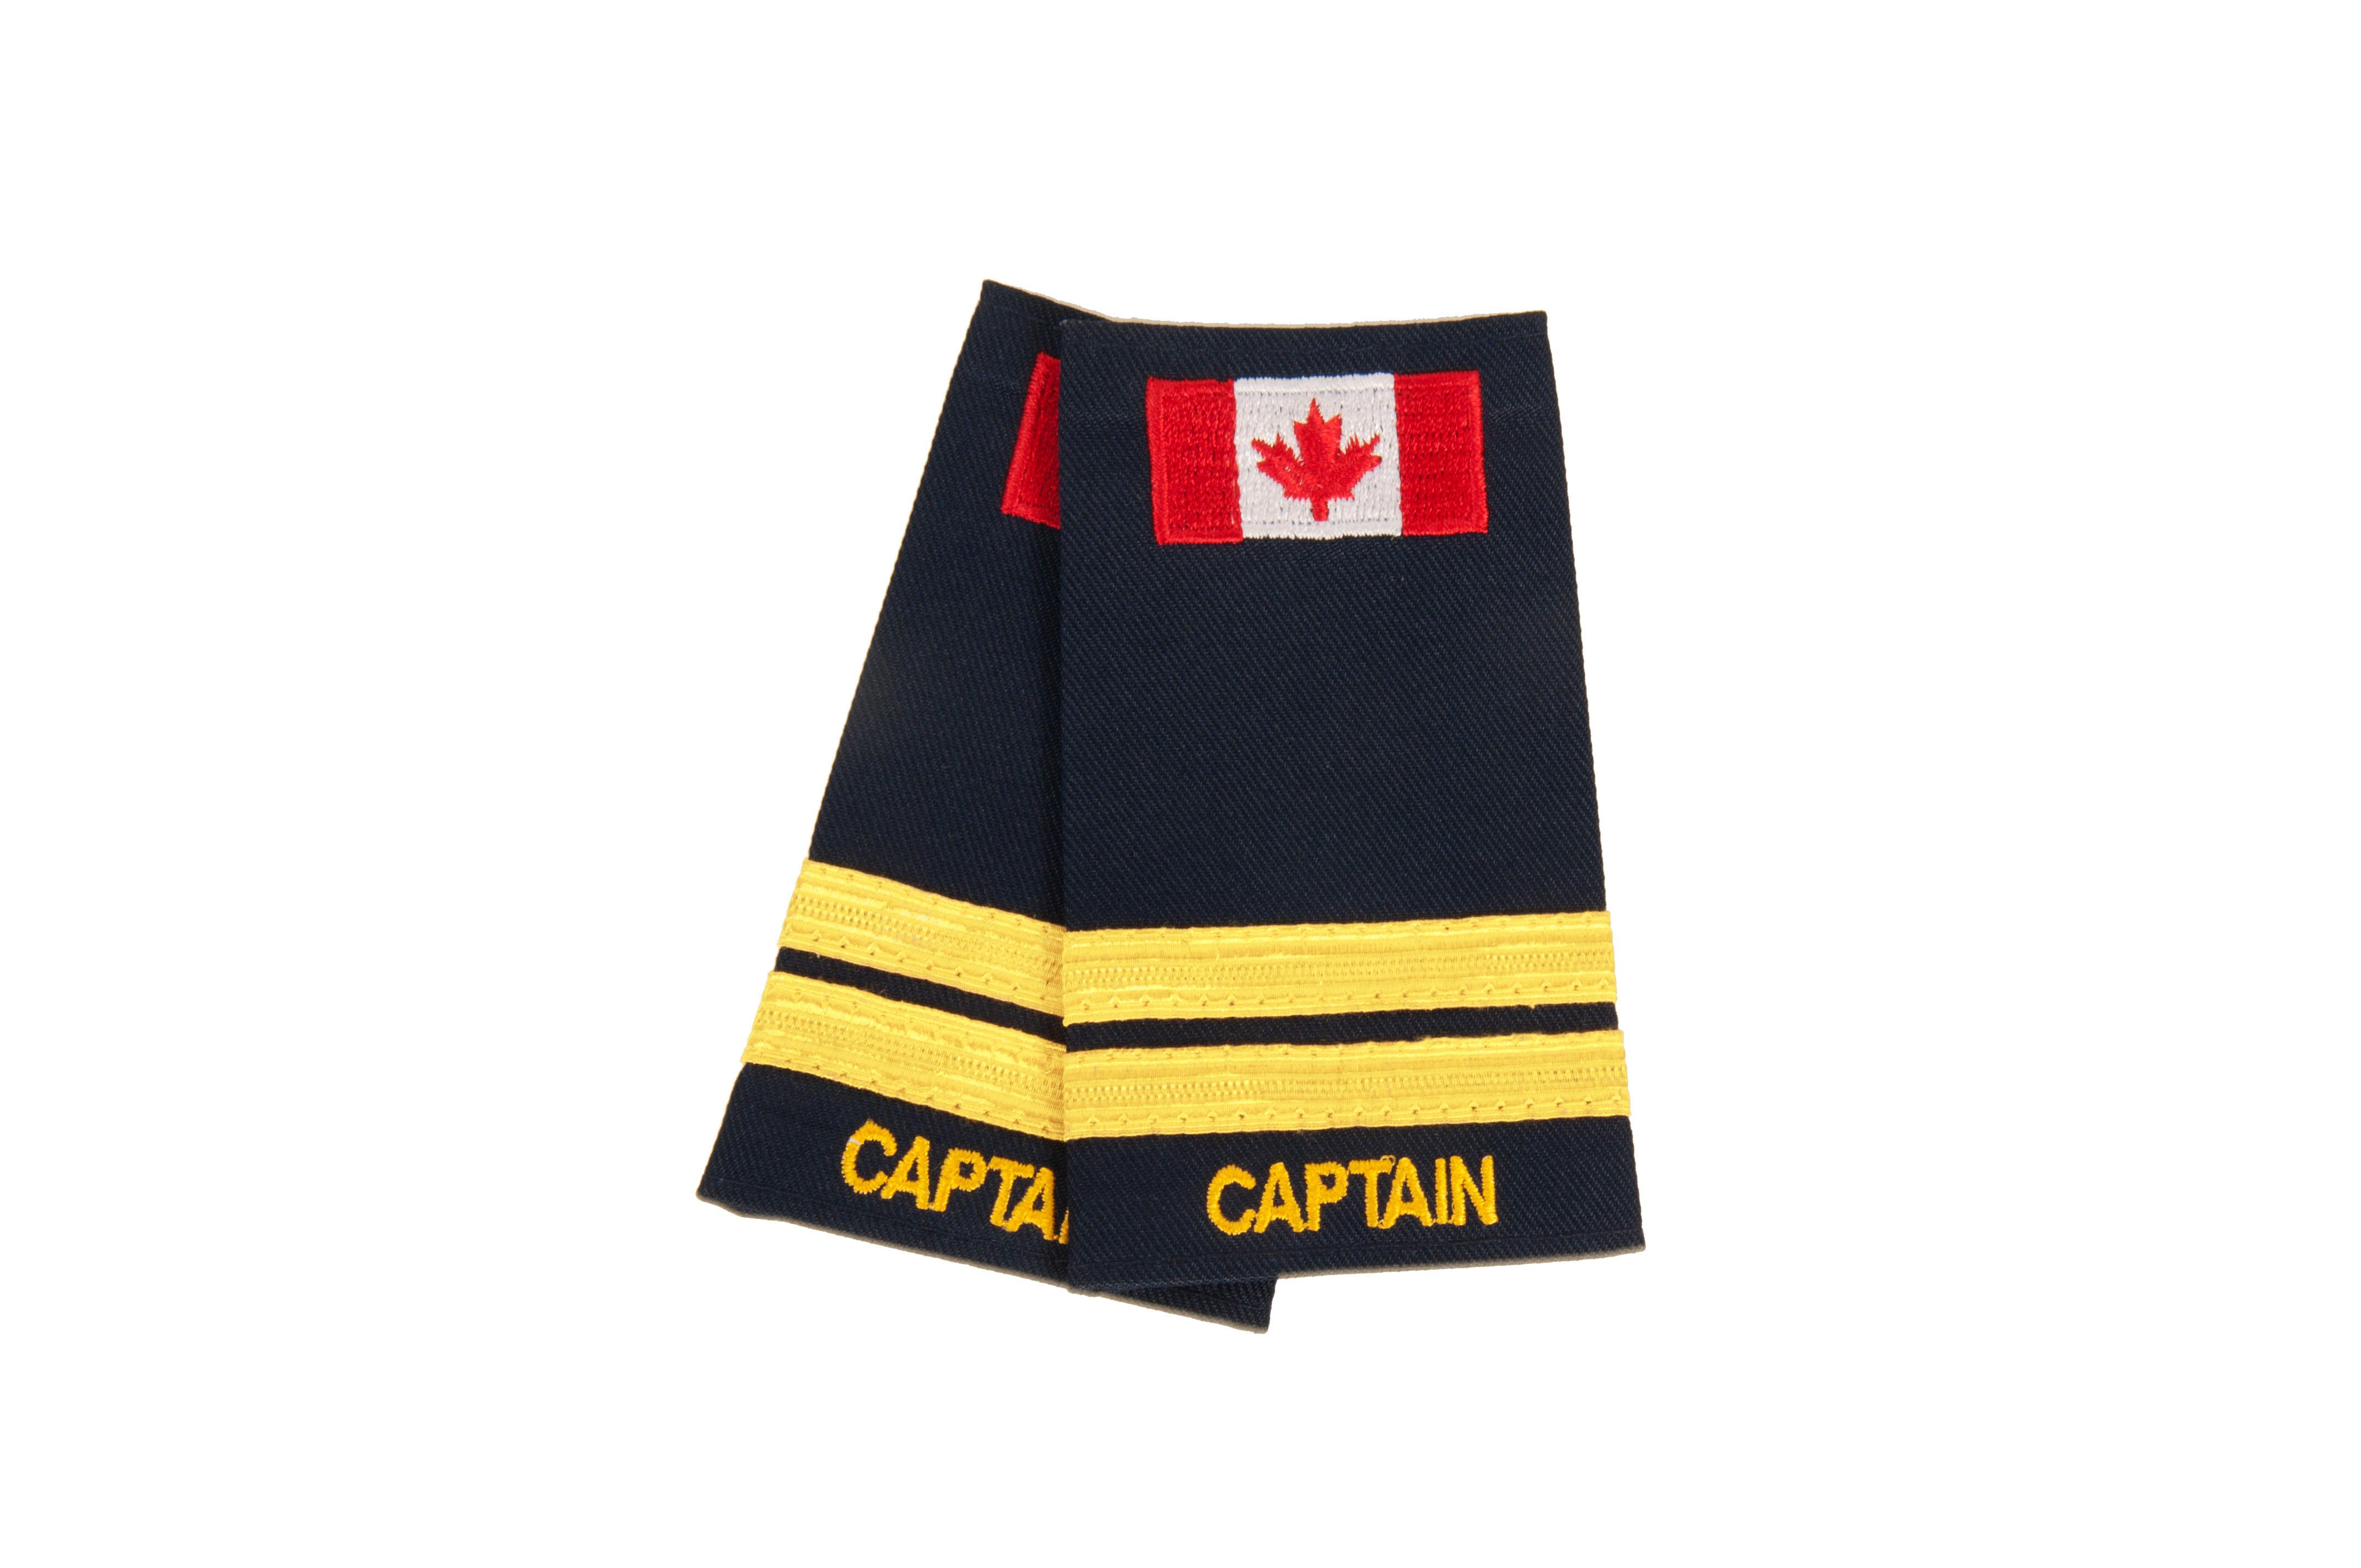 Metallic Captain 2 Braid Slip-On with Canadian Flag-